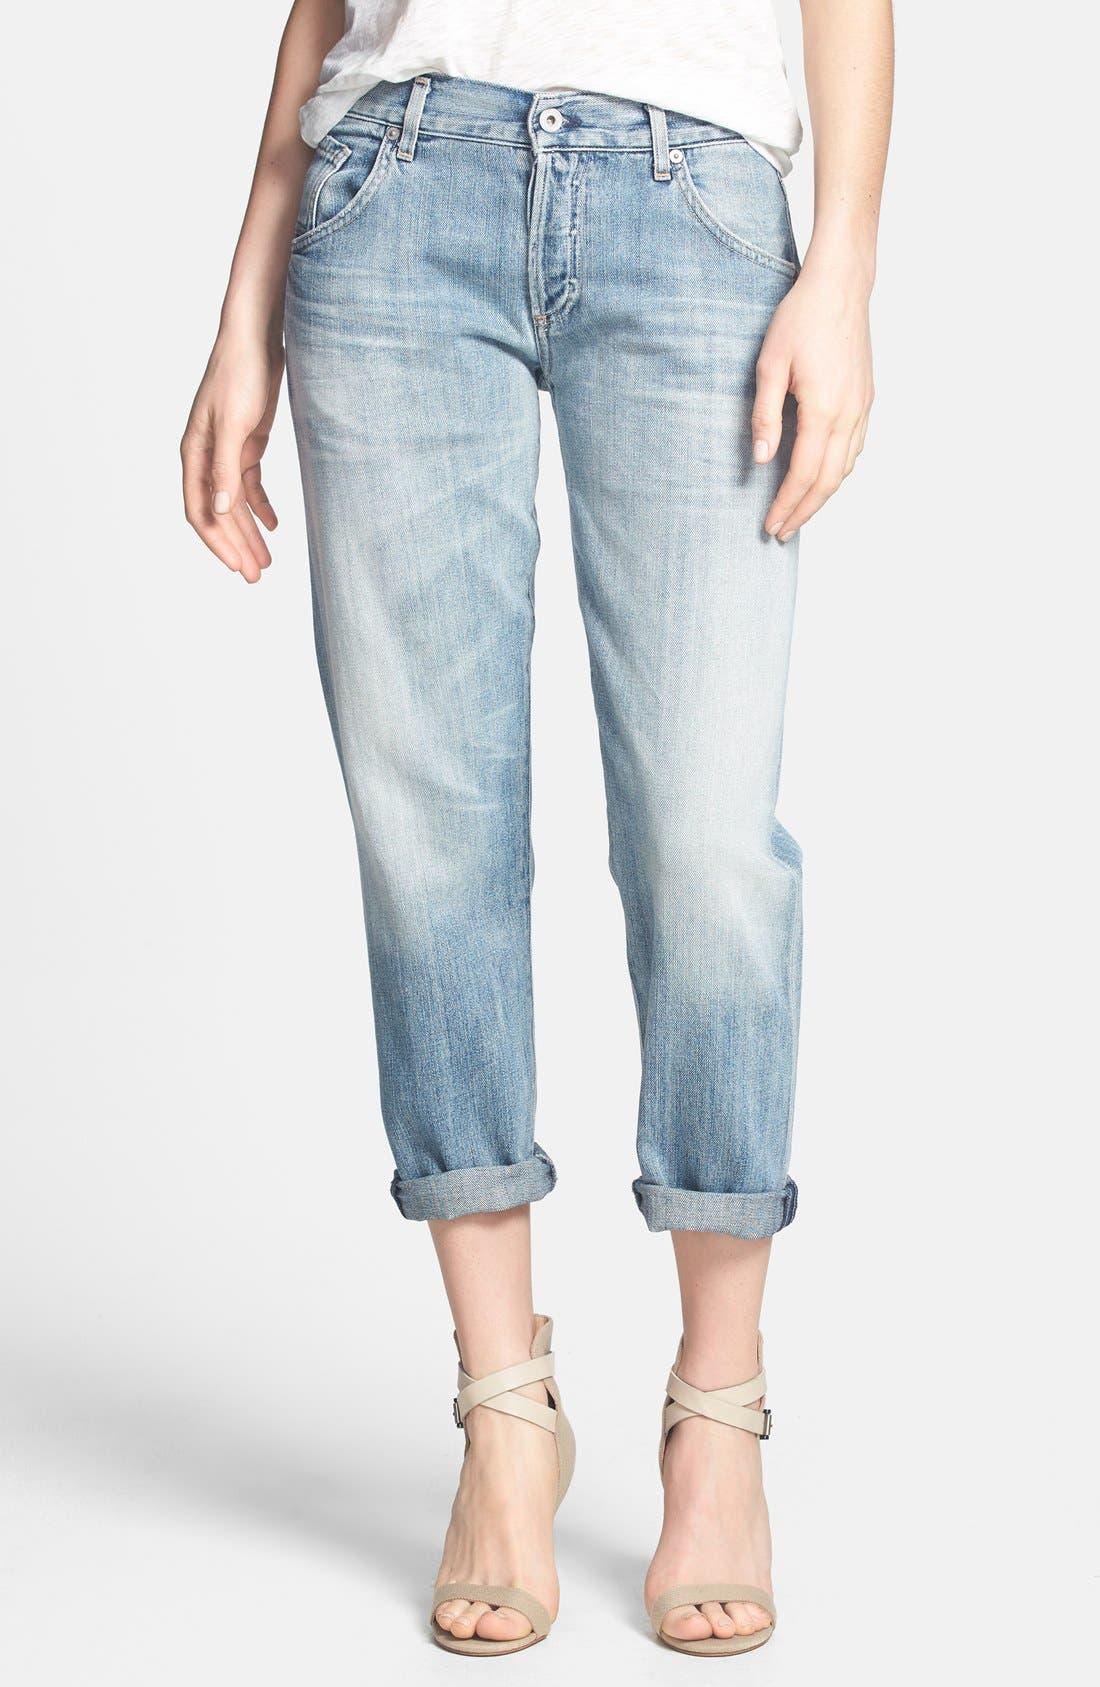 Main Image - Citizens of Humanity 'Premium Vintage - Skyler' Boyfriend Crop Jeans (Archive)